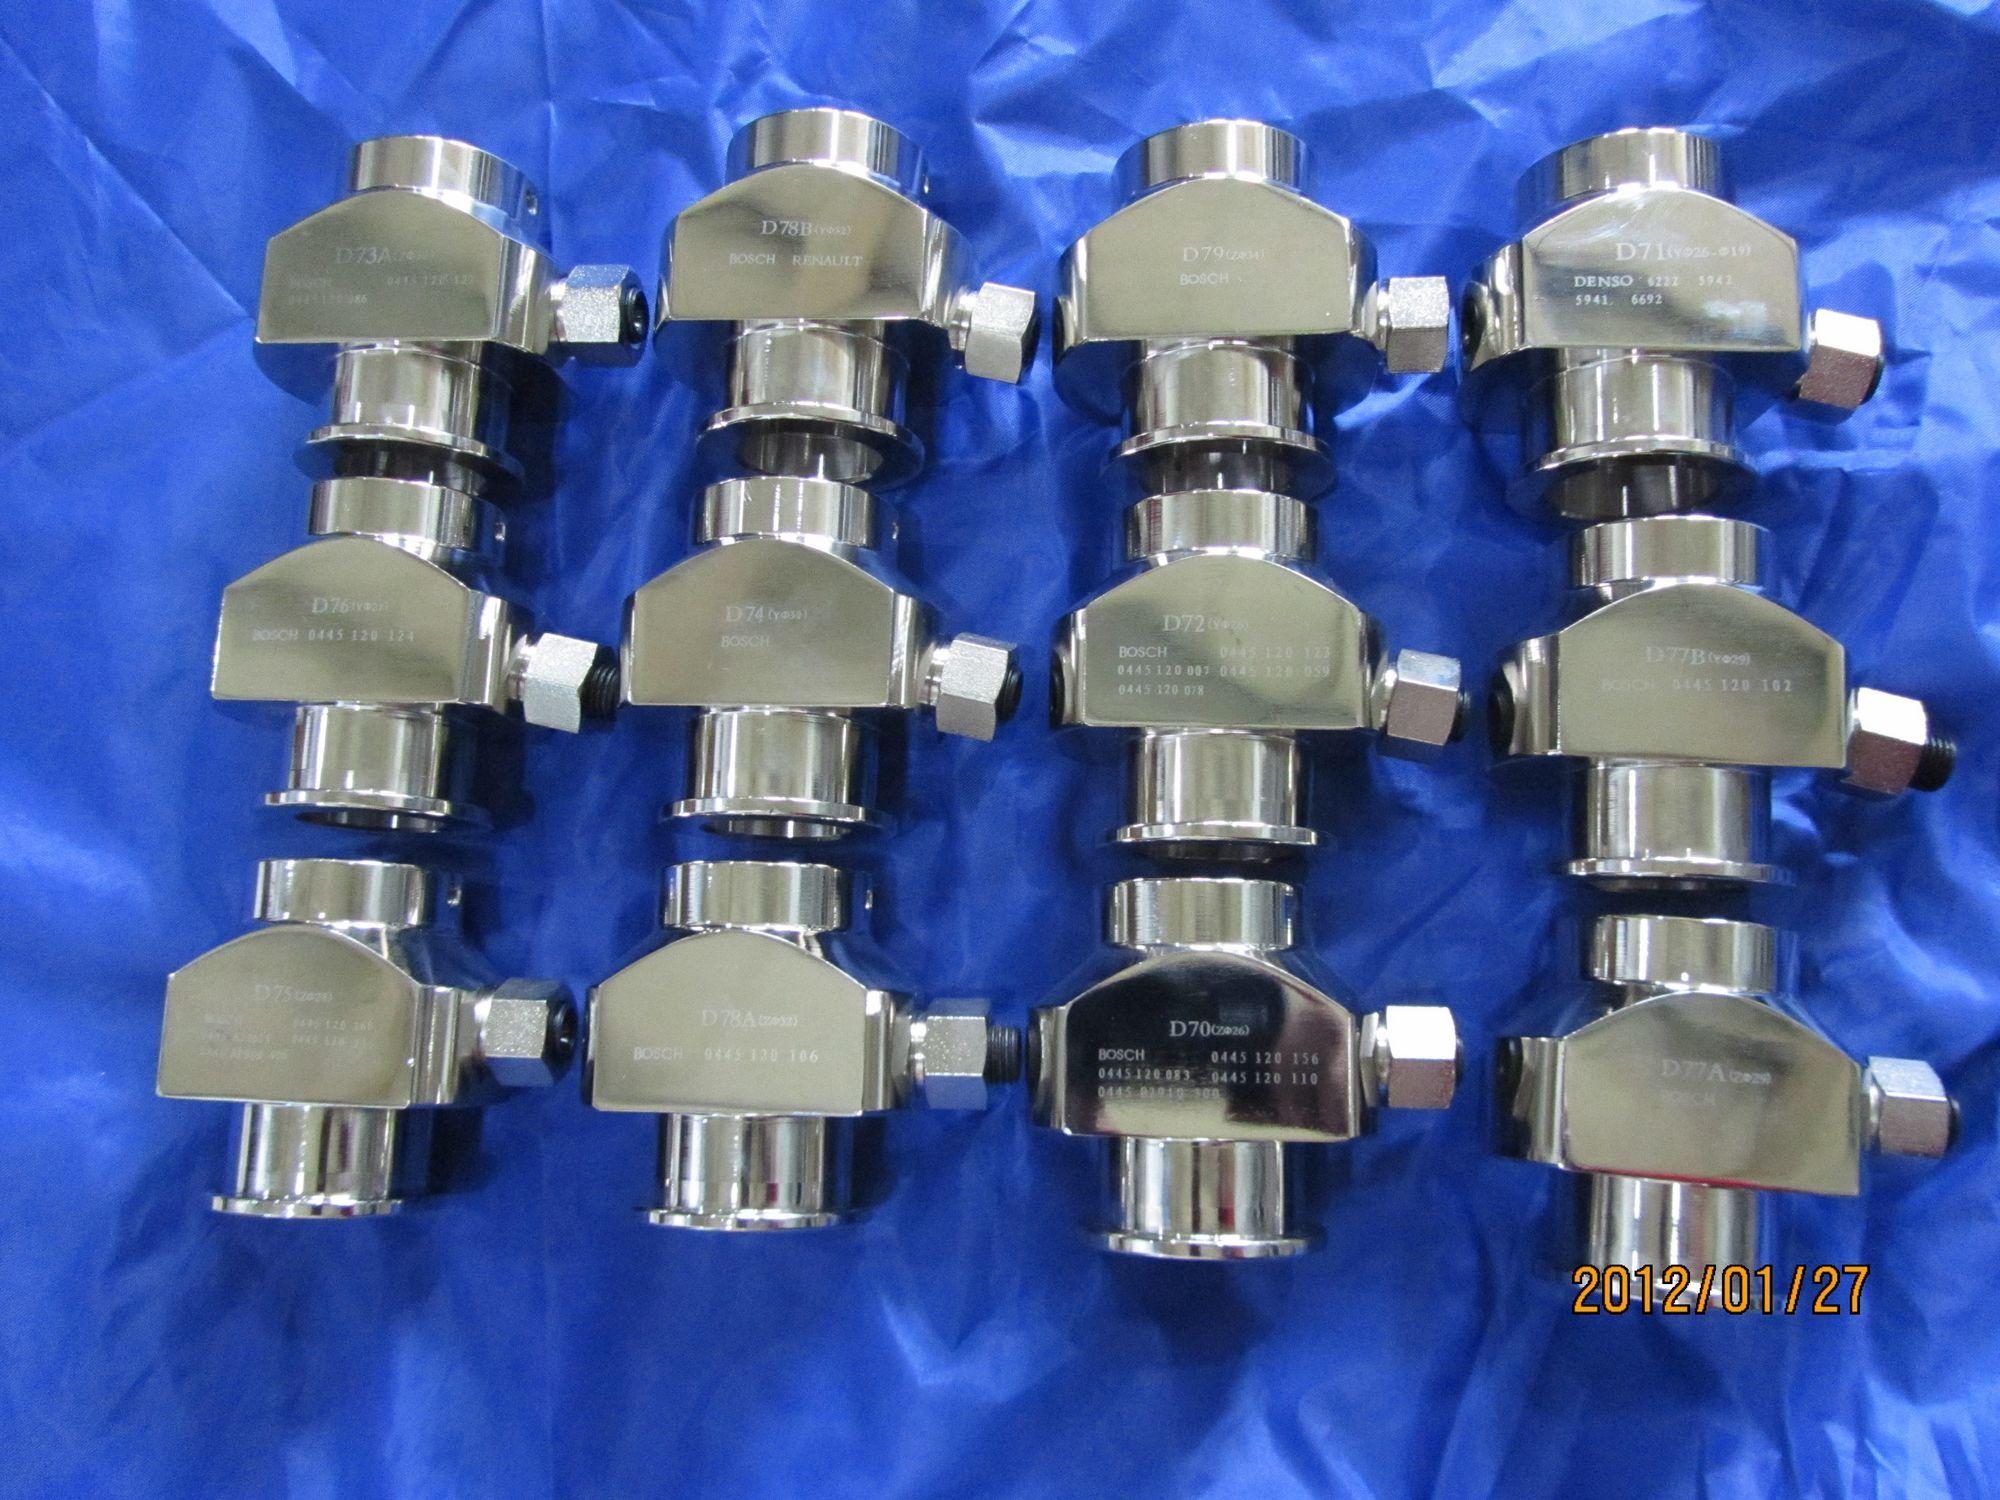 Common rail injector adaptors, tools diesel, injector adaptors,injector clamps,tools for electronic injection,tools for car repair